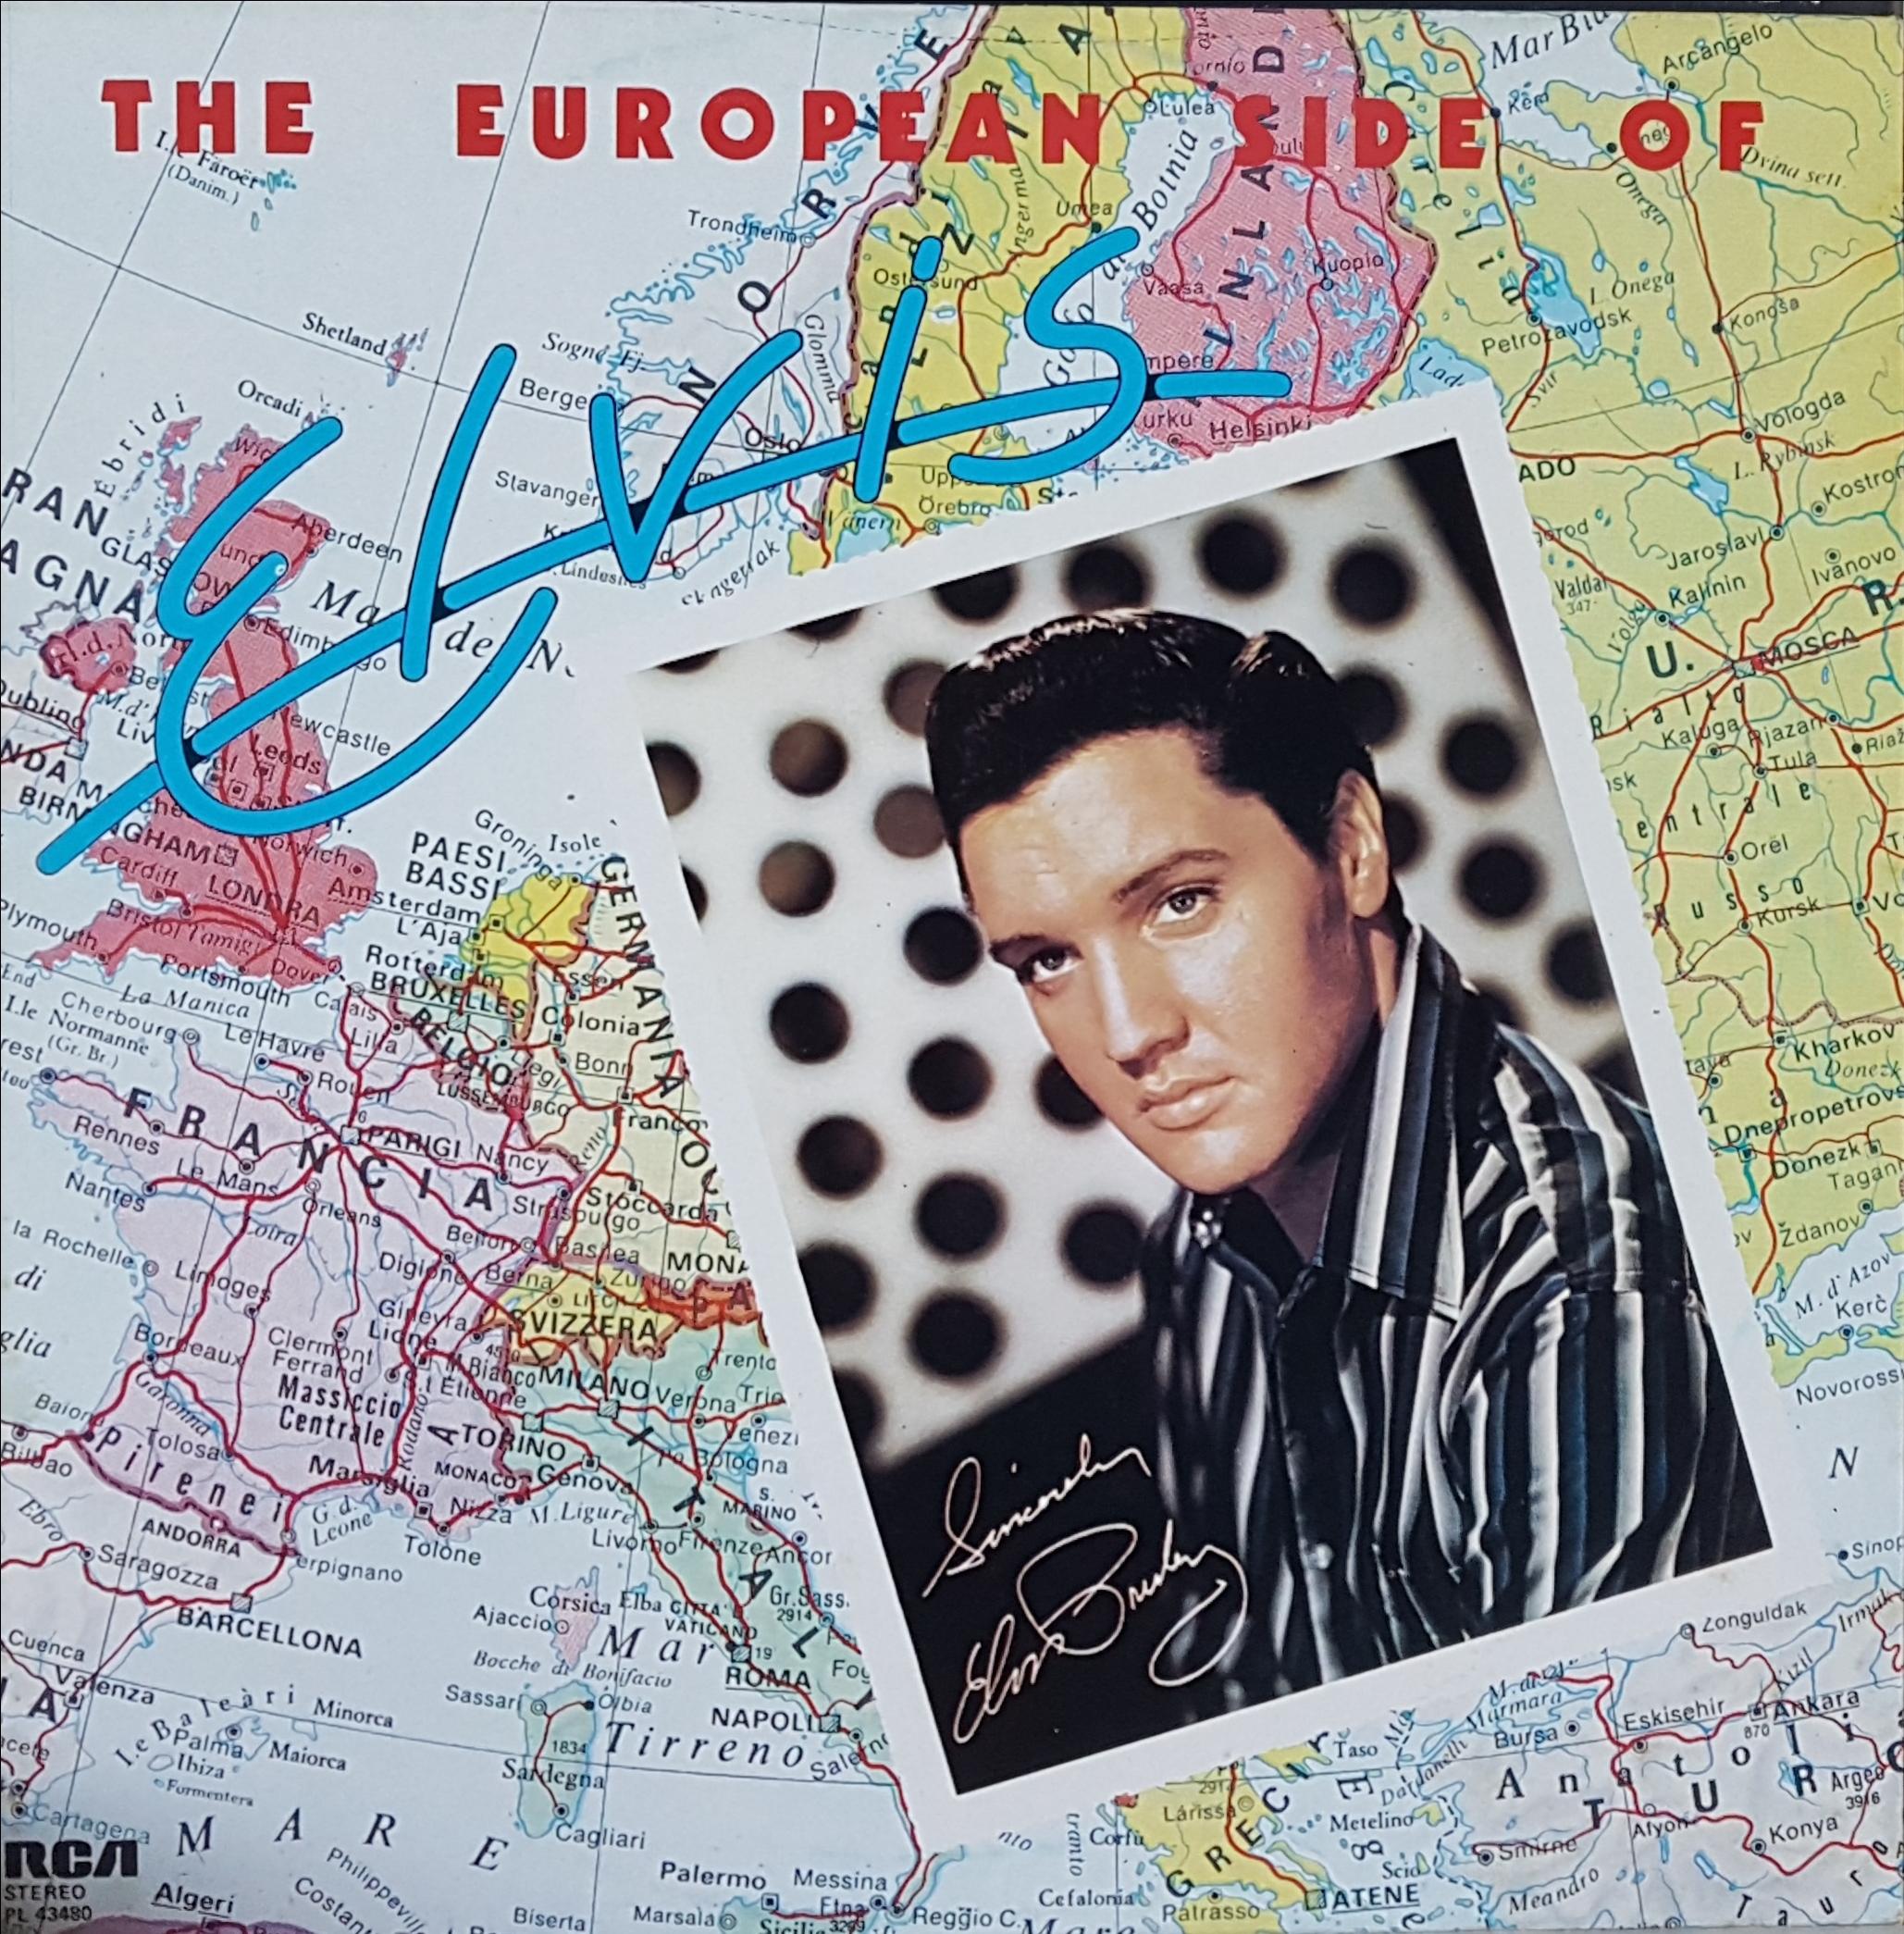 THE EUROPEAN SIDE OF ELVIS 20180424_151800qsu4s